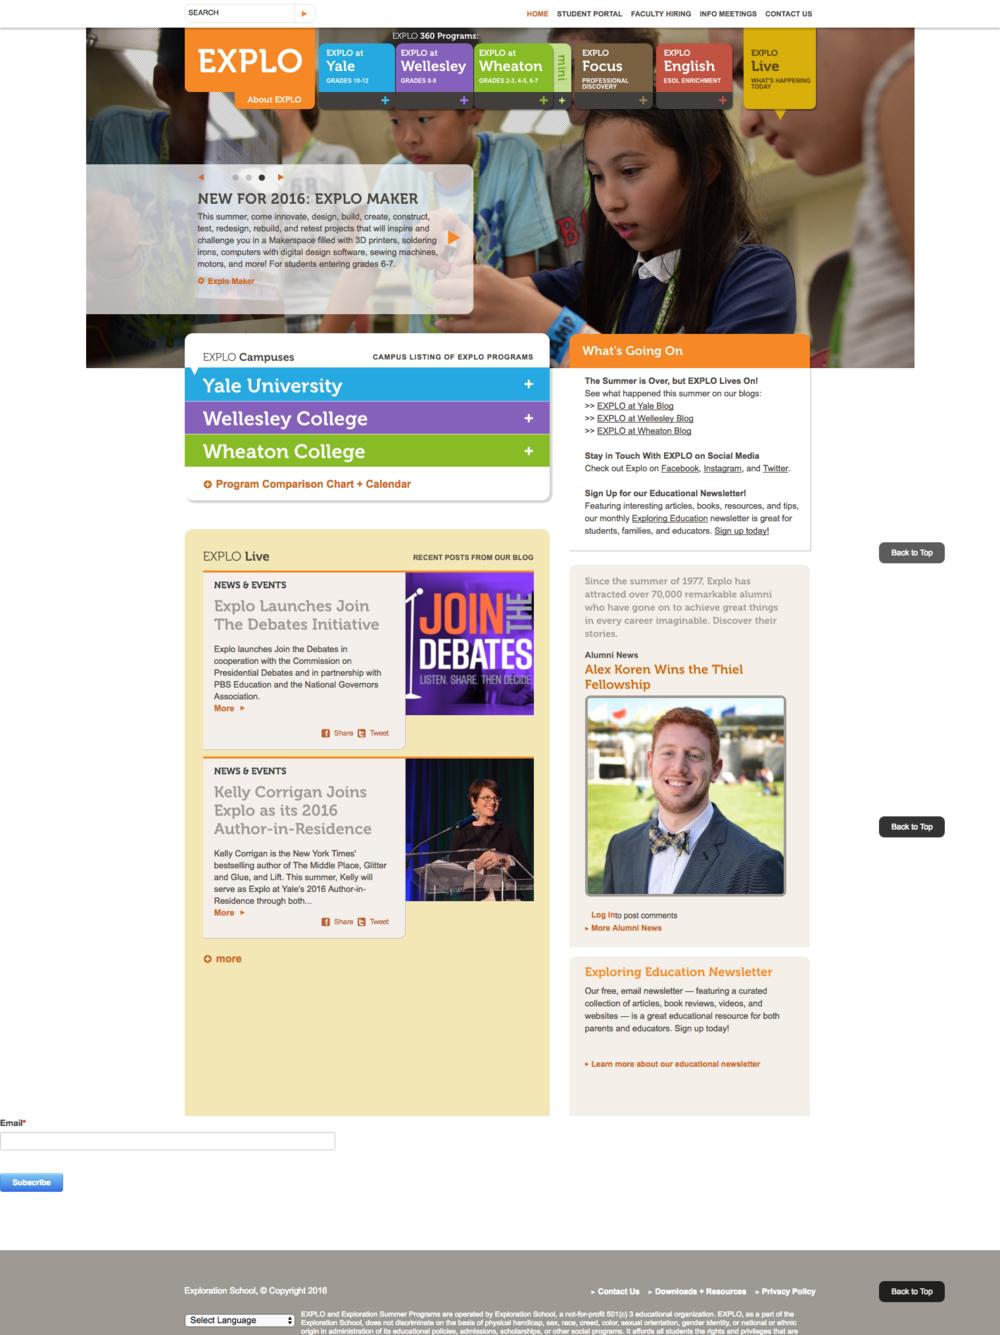 The previous EXPLO website